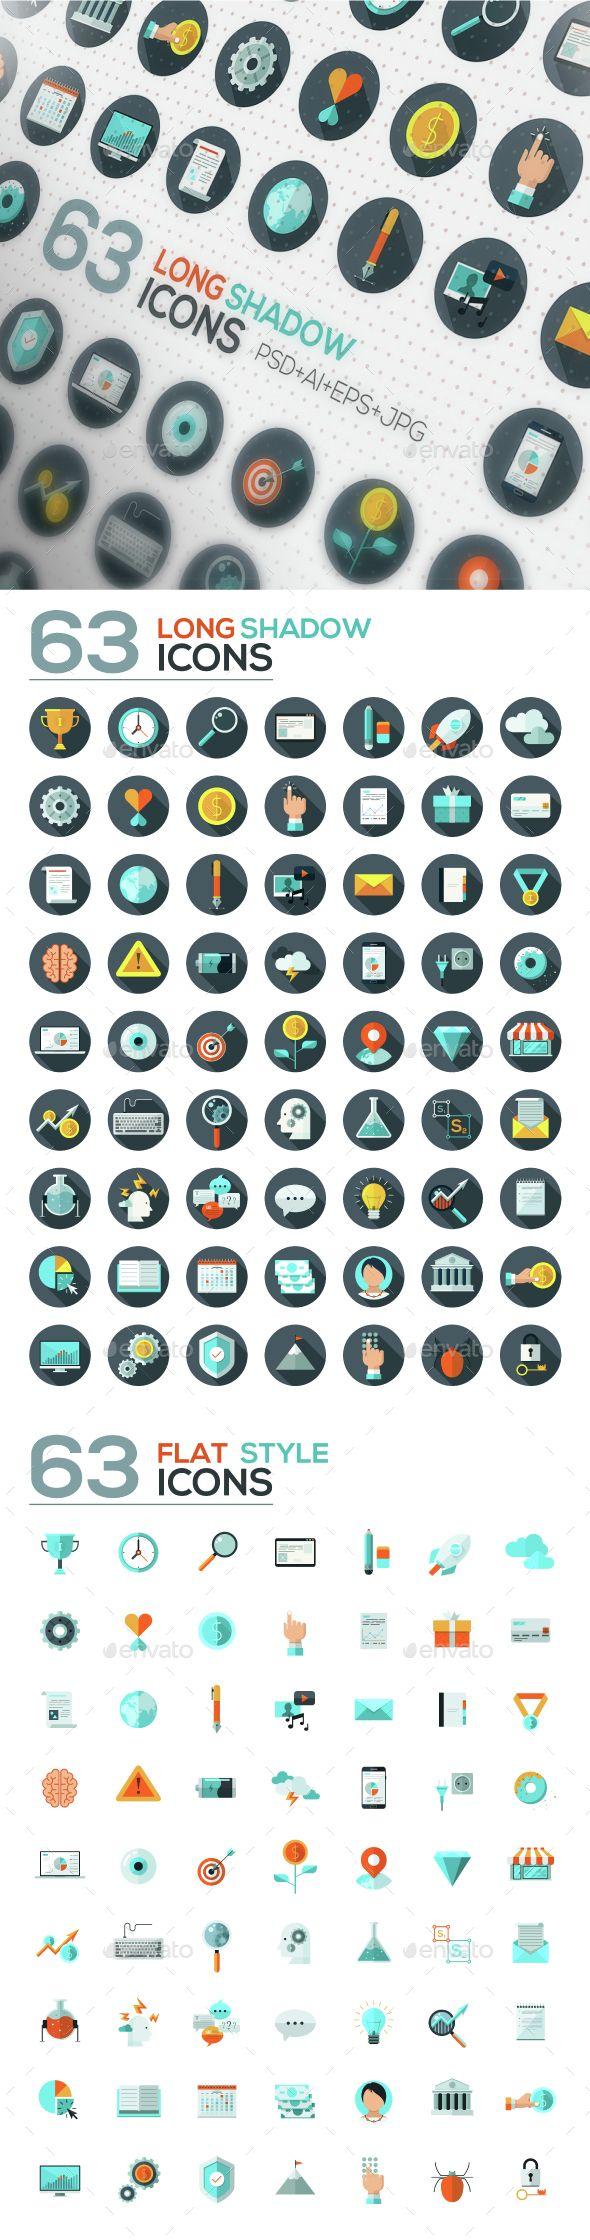 Best 25 internet icon ideas on pinterest business icon flat best 25 internet icon ideas on pinterest business icon flat icons and data icon biocorpaavc